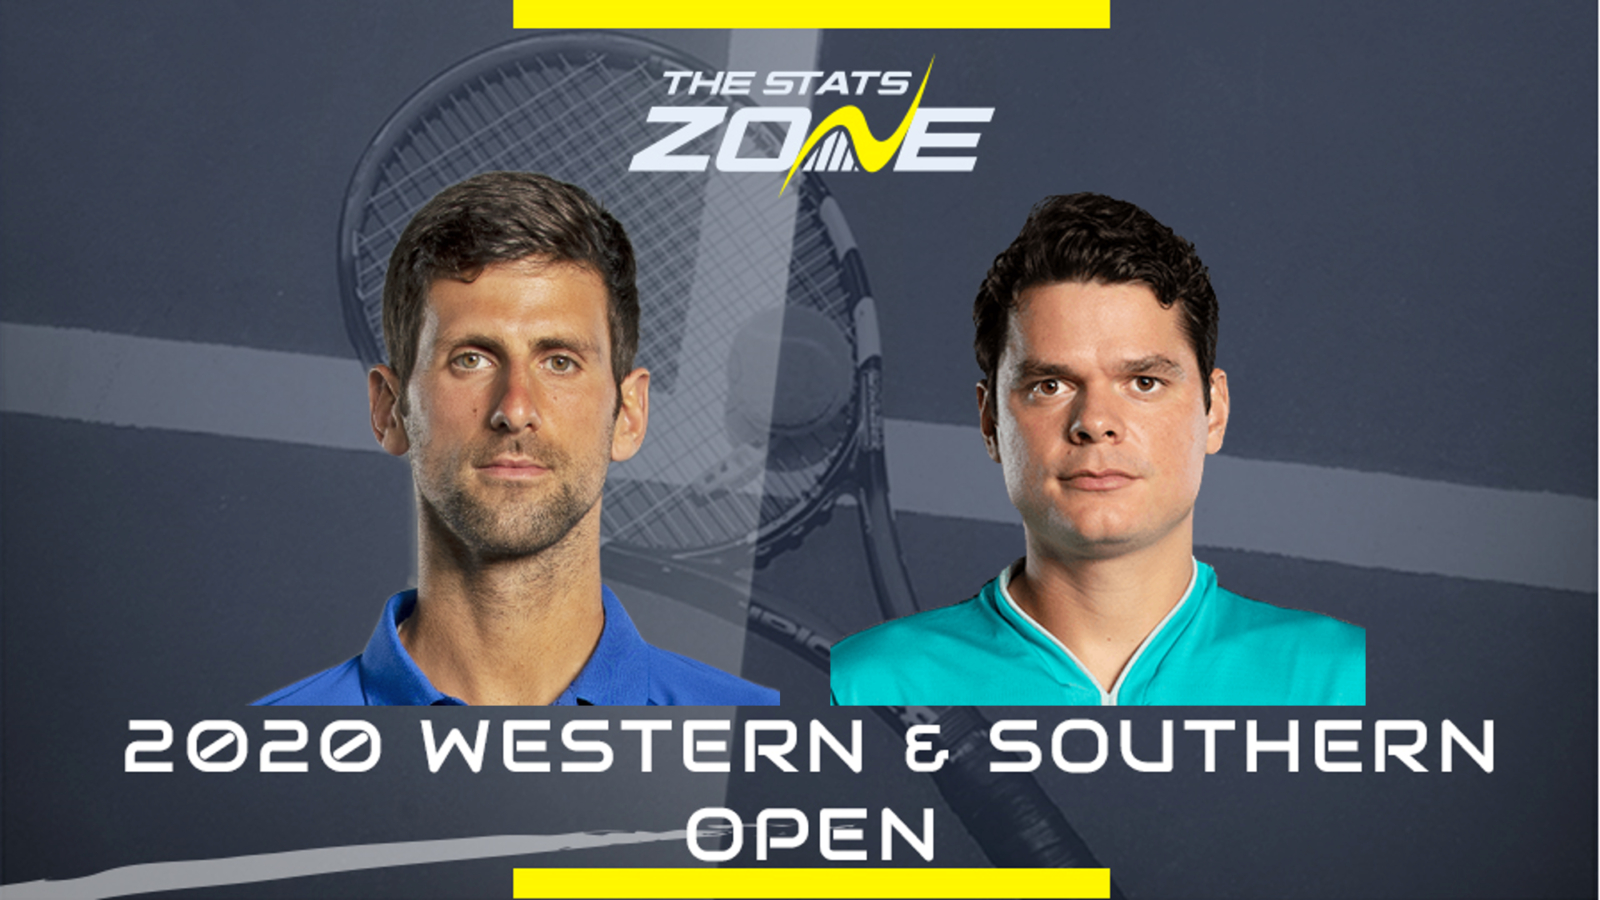 2020 Western Southern Open Novak Djokovic Vs Milos Raonic Preview Prediction The Stats Zone